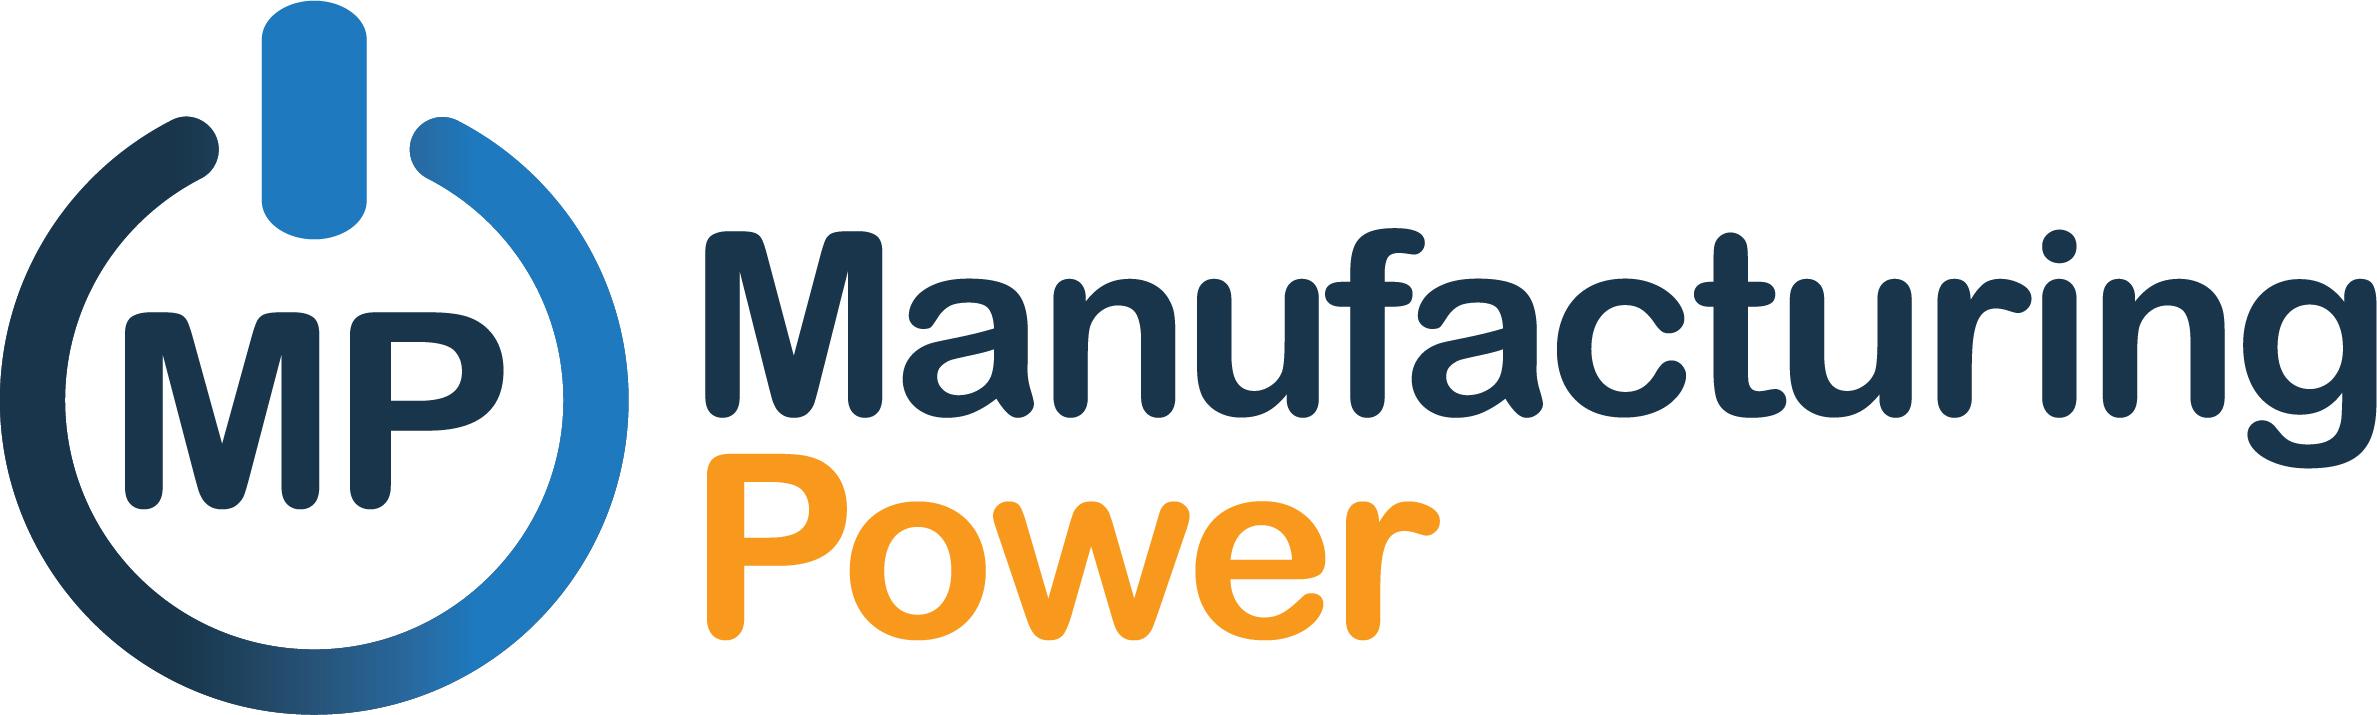 Robotics & Automation News Video Podcast Interviews Mike Franz ManufacturingPower CEO